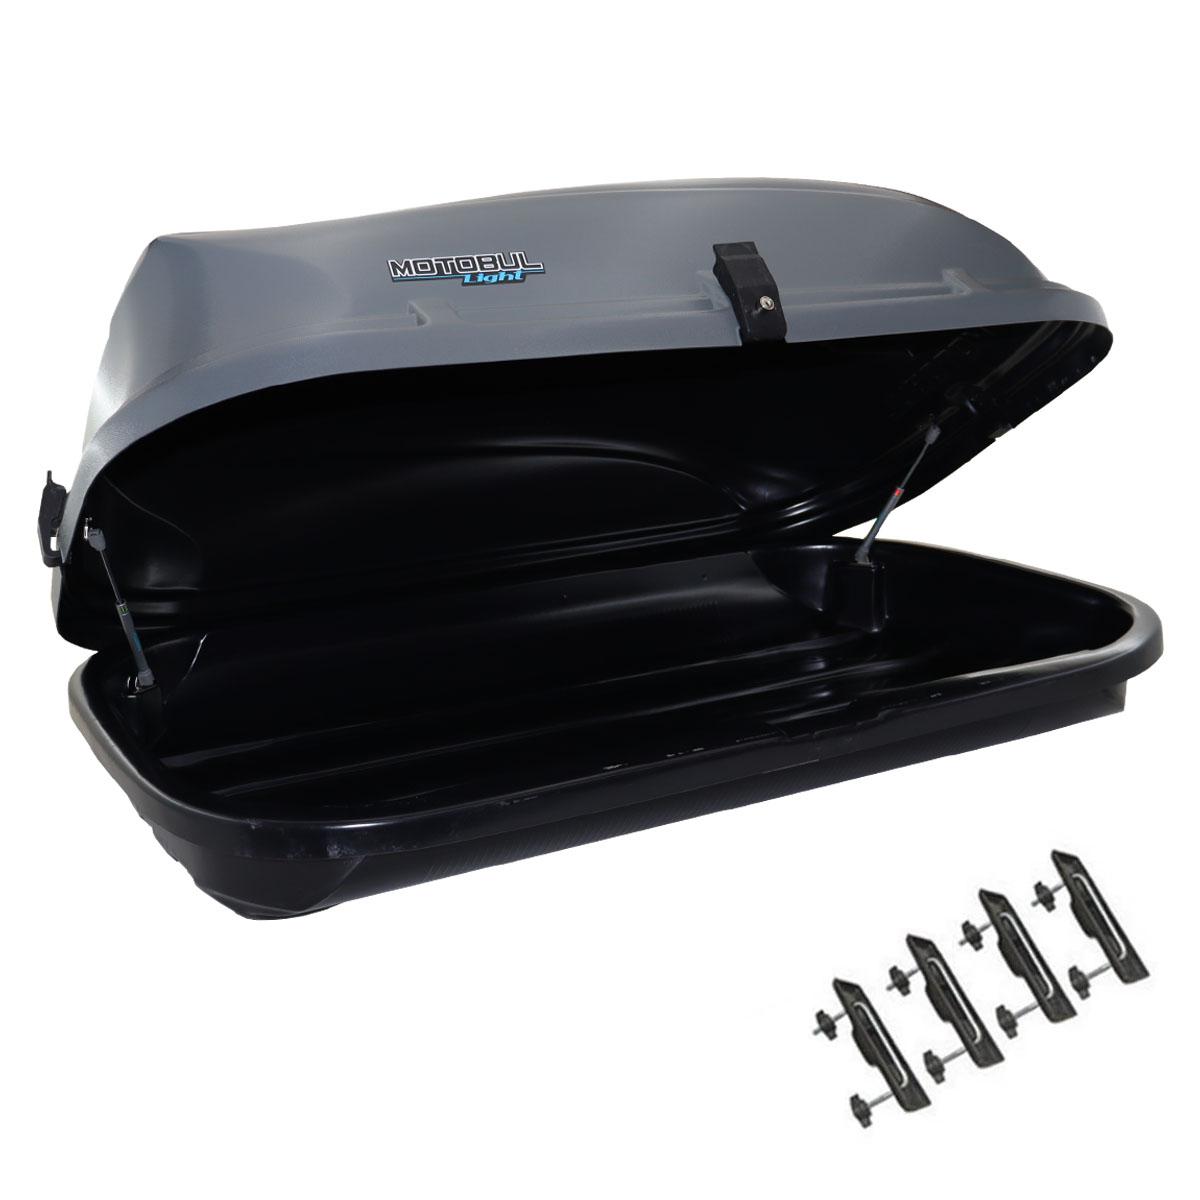 Bagageiro de teto maleiro com chave Motobul 460 litros cinza modelo Light